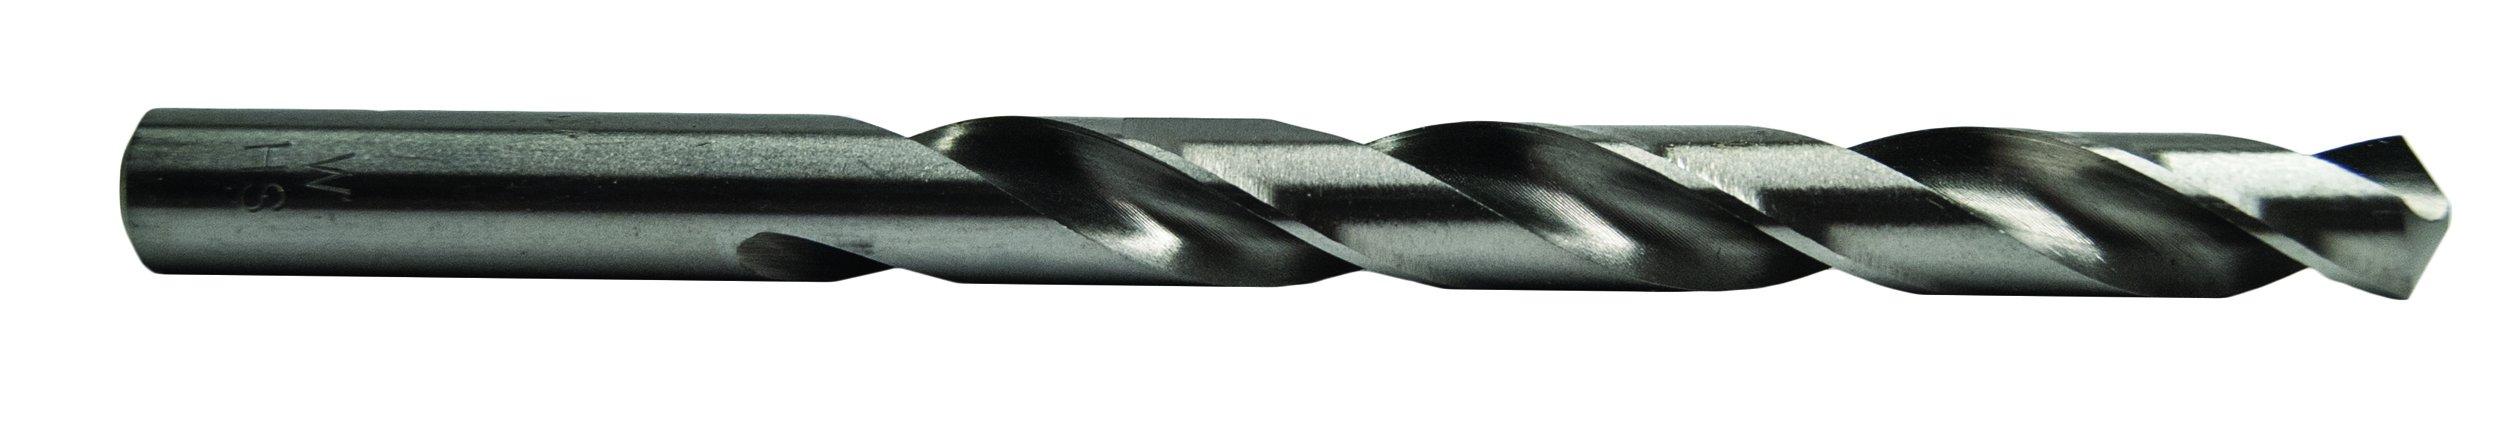 Century Drill & Tool 11623 Letter Gauge Drill Bit, Size-W